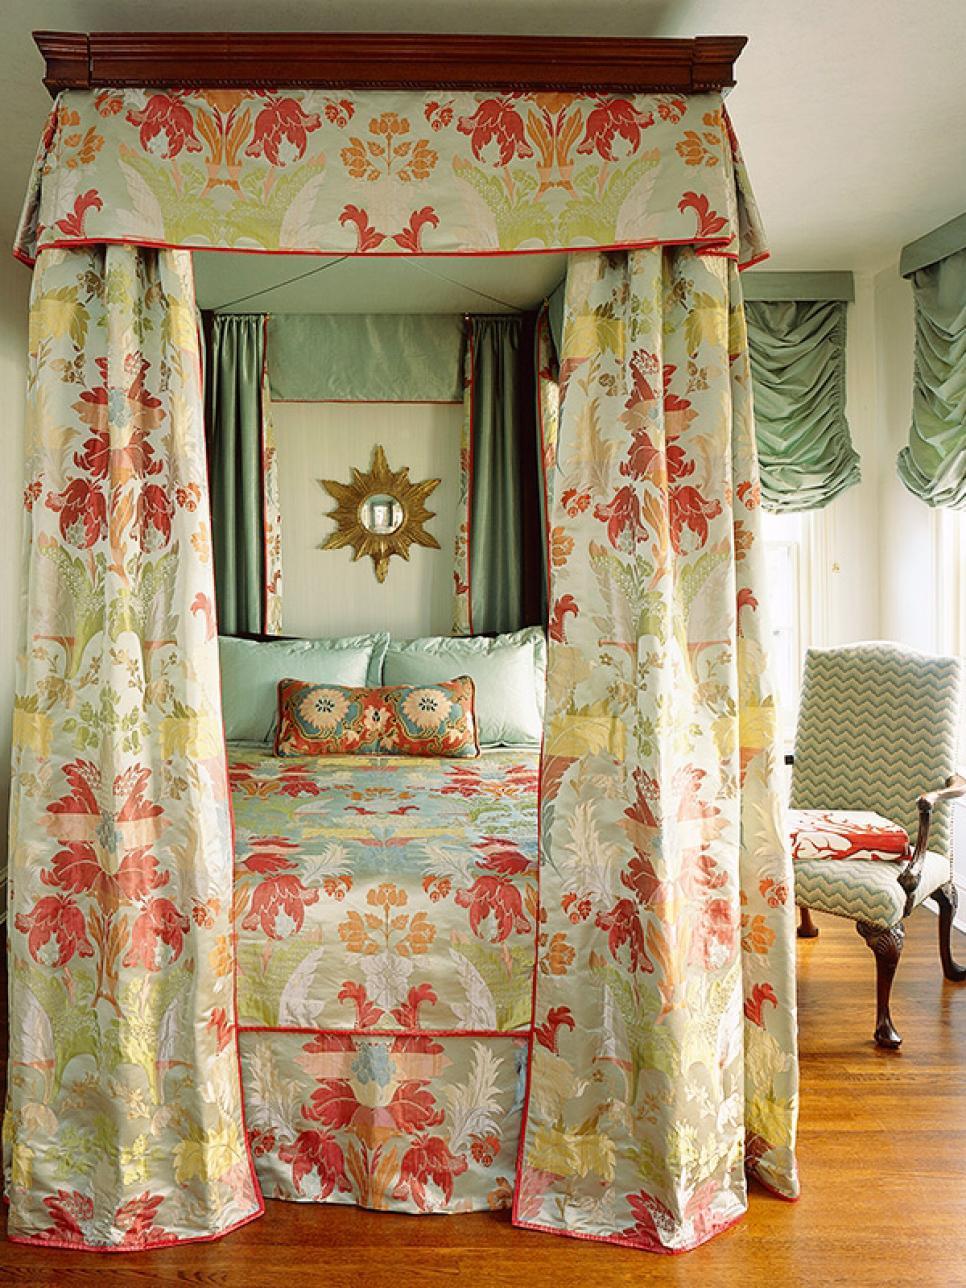 25 Victorian Bedroom Design Ideas - Decoration Love